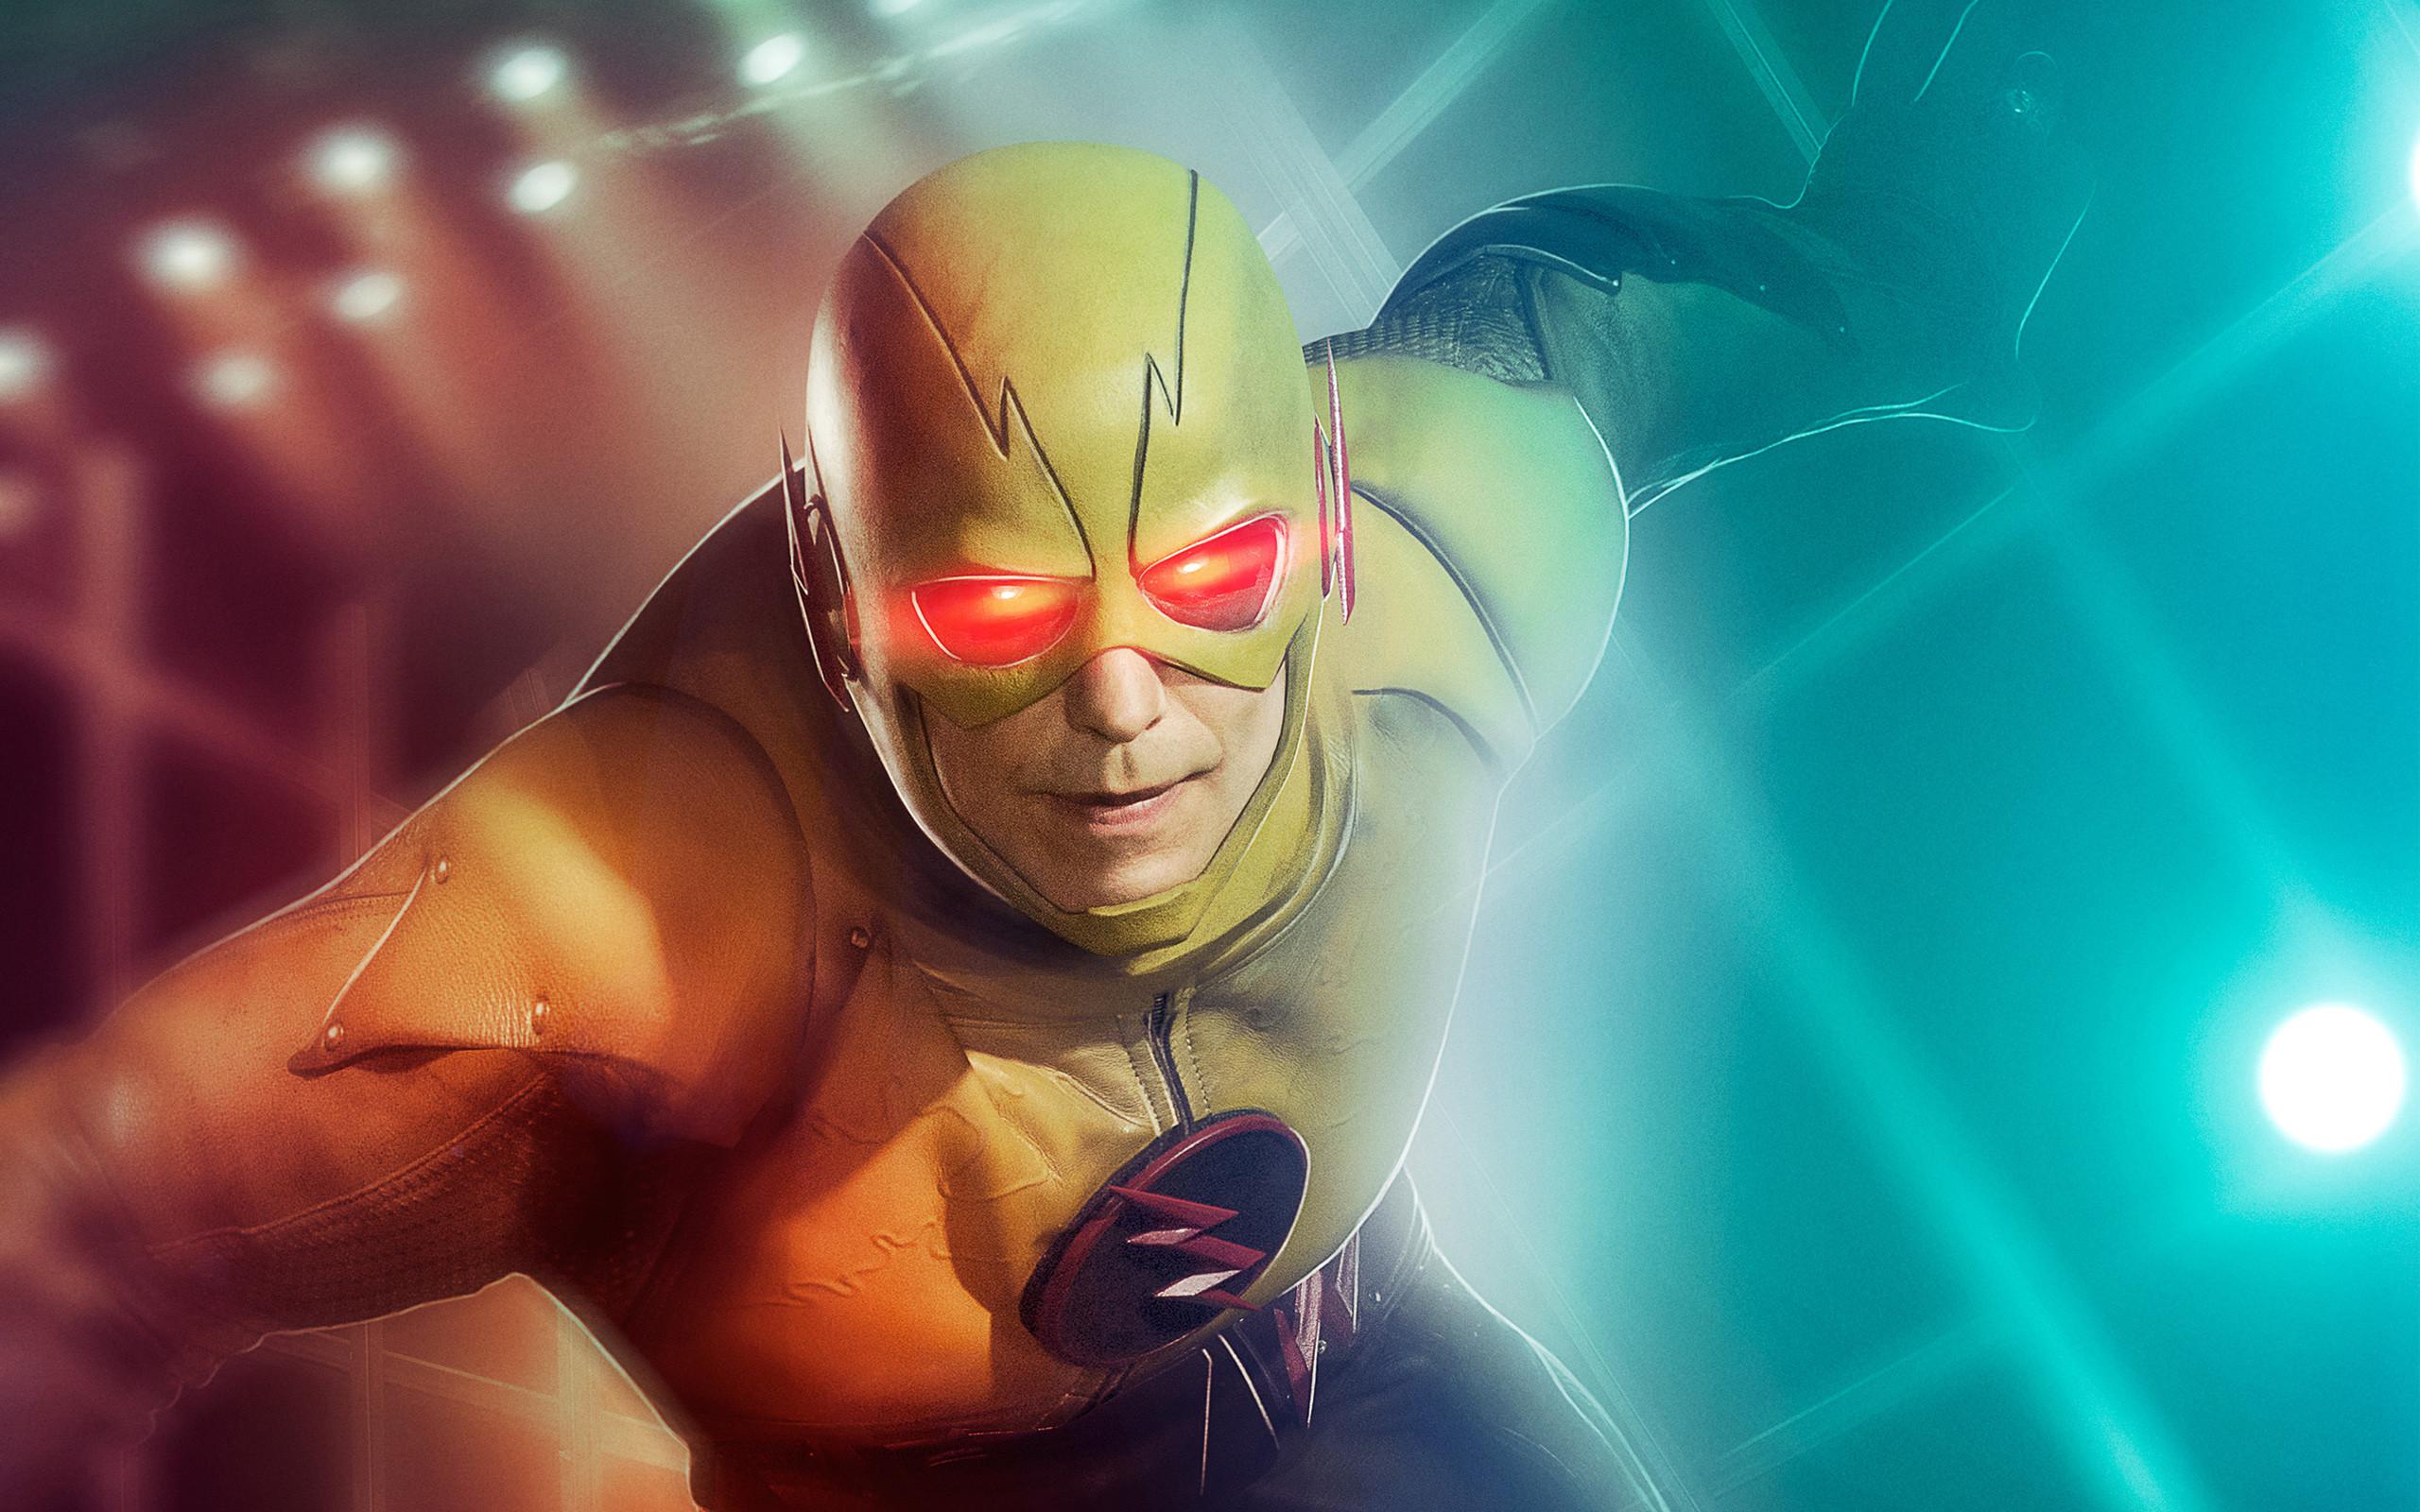 Eddie Thawne in The Flash Wallpapers | HD Wallpapers